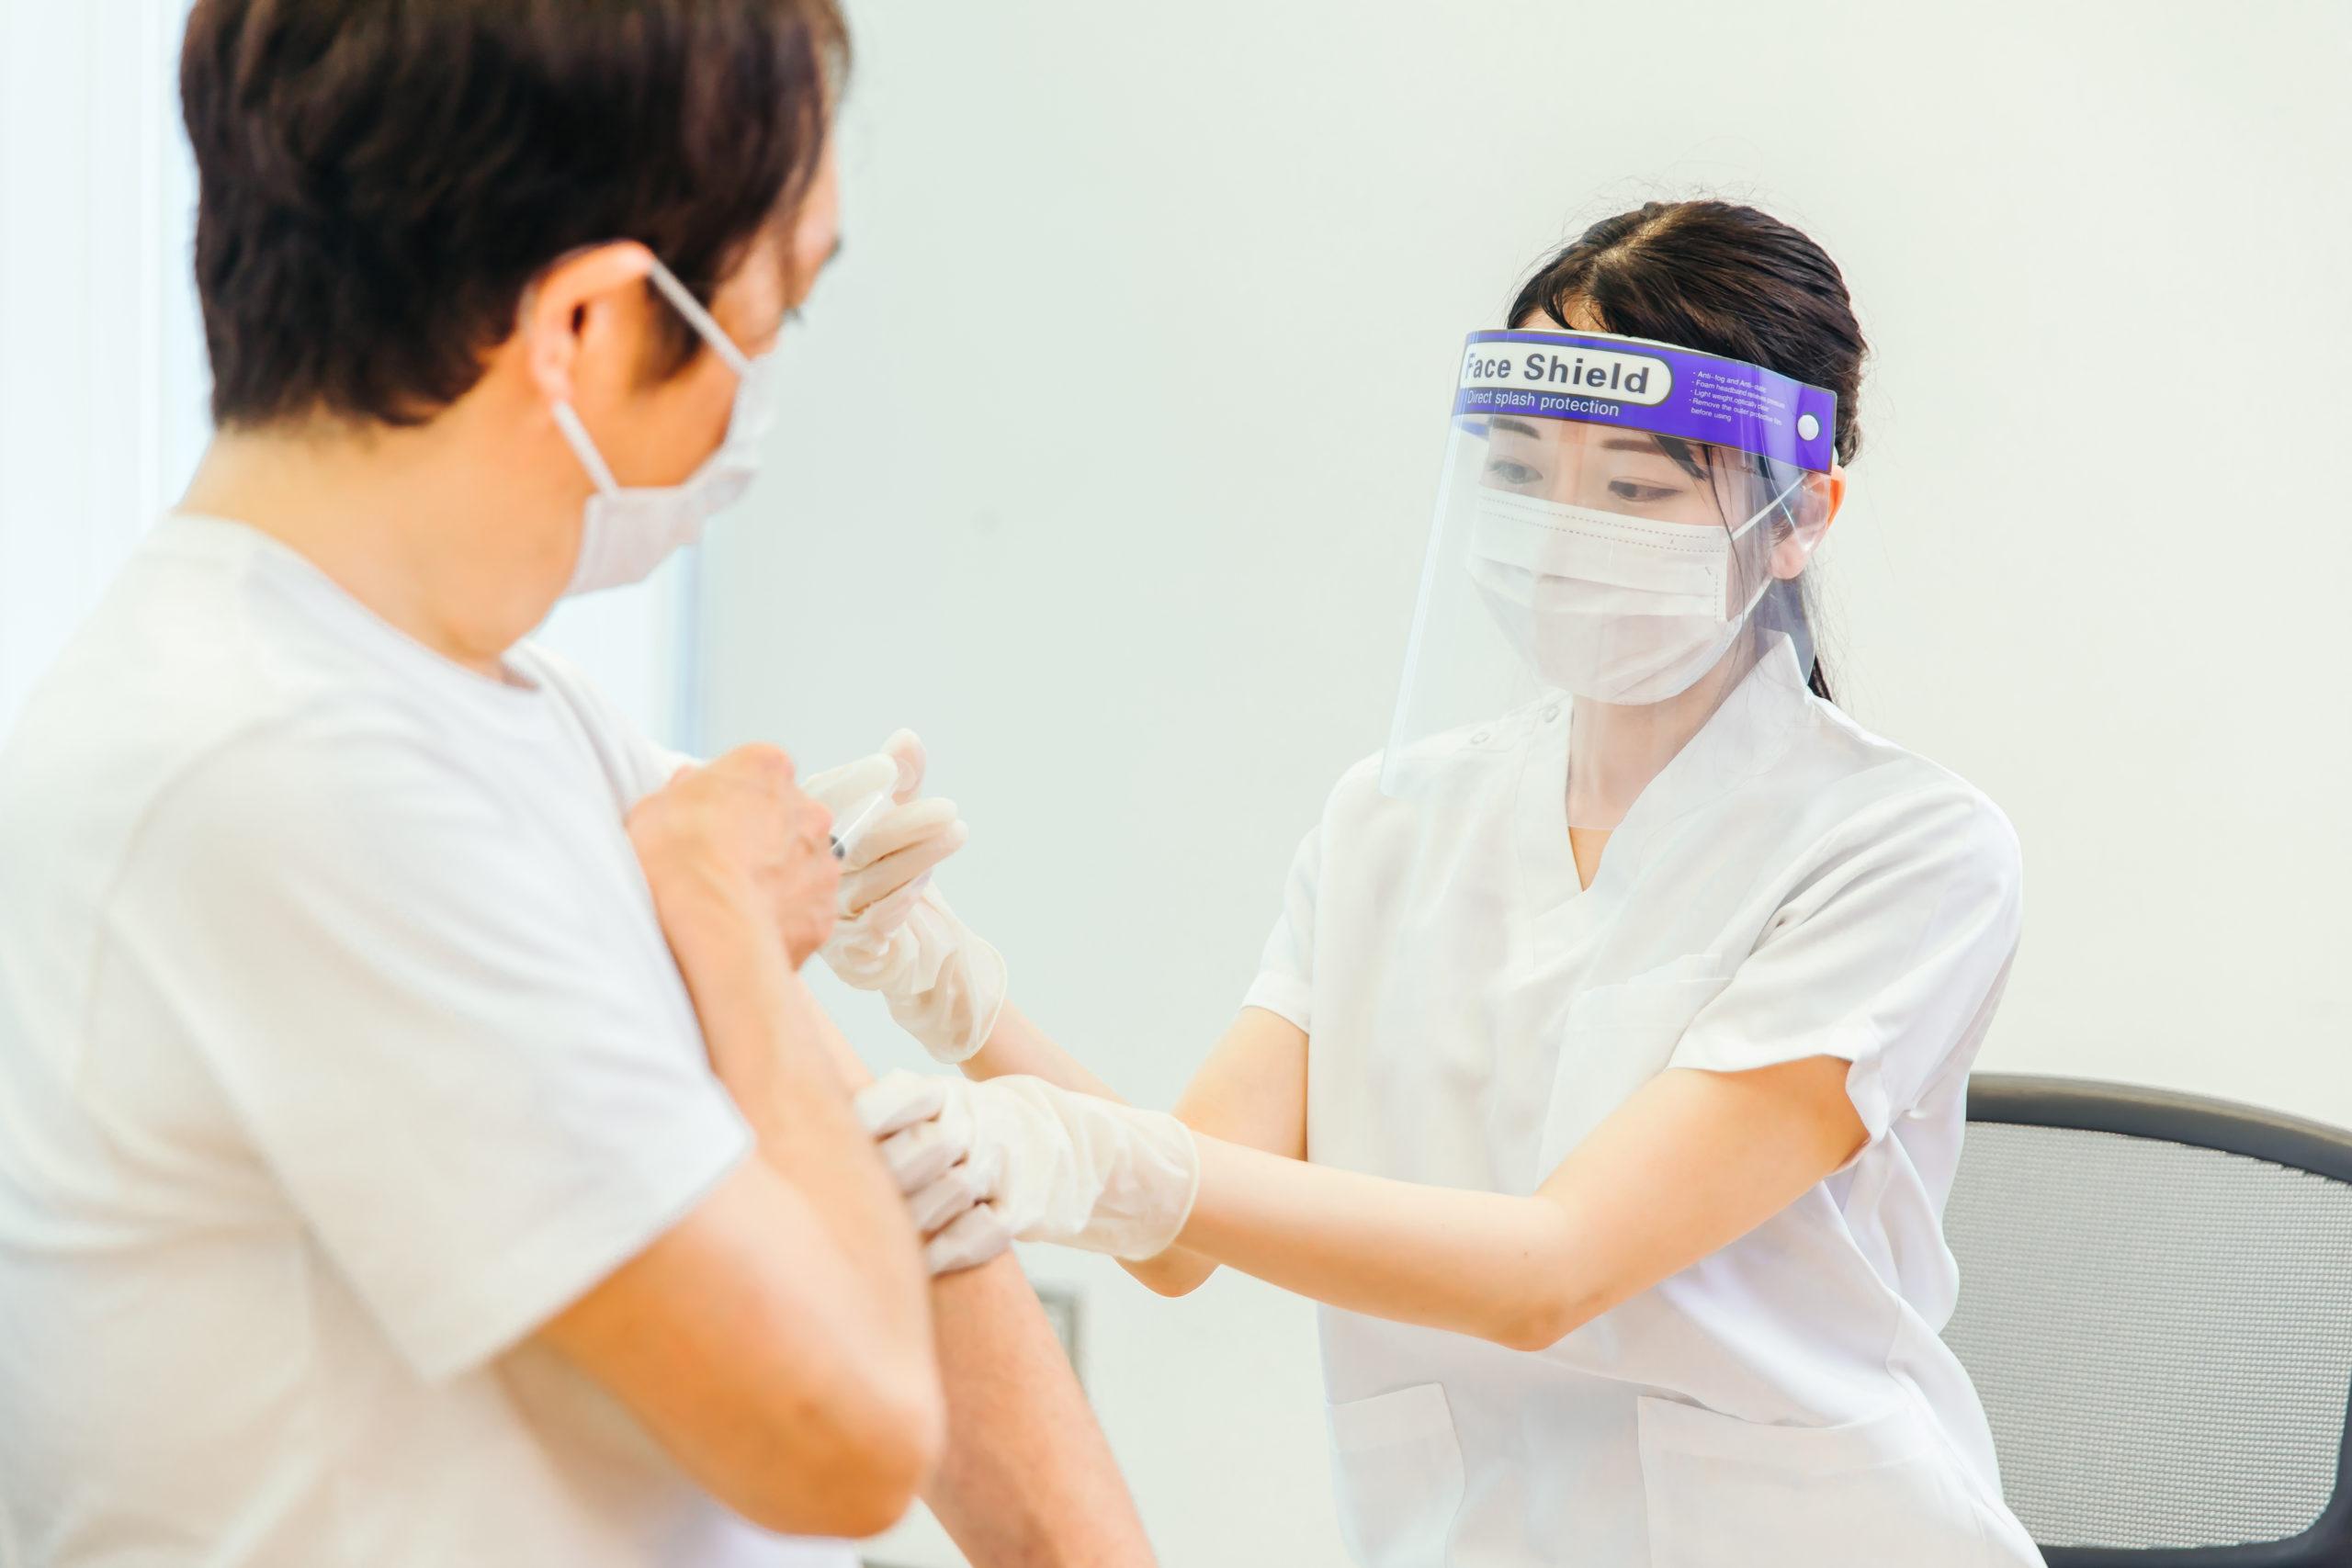 22024836_l-1-scaled 【大阪市】アストラゼネカ(アストラ)製ワクチン接種の予約方法は?会場や対象年齢も調査!